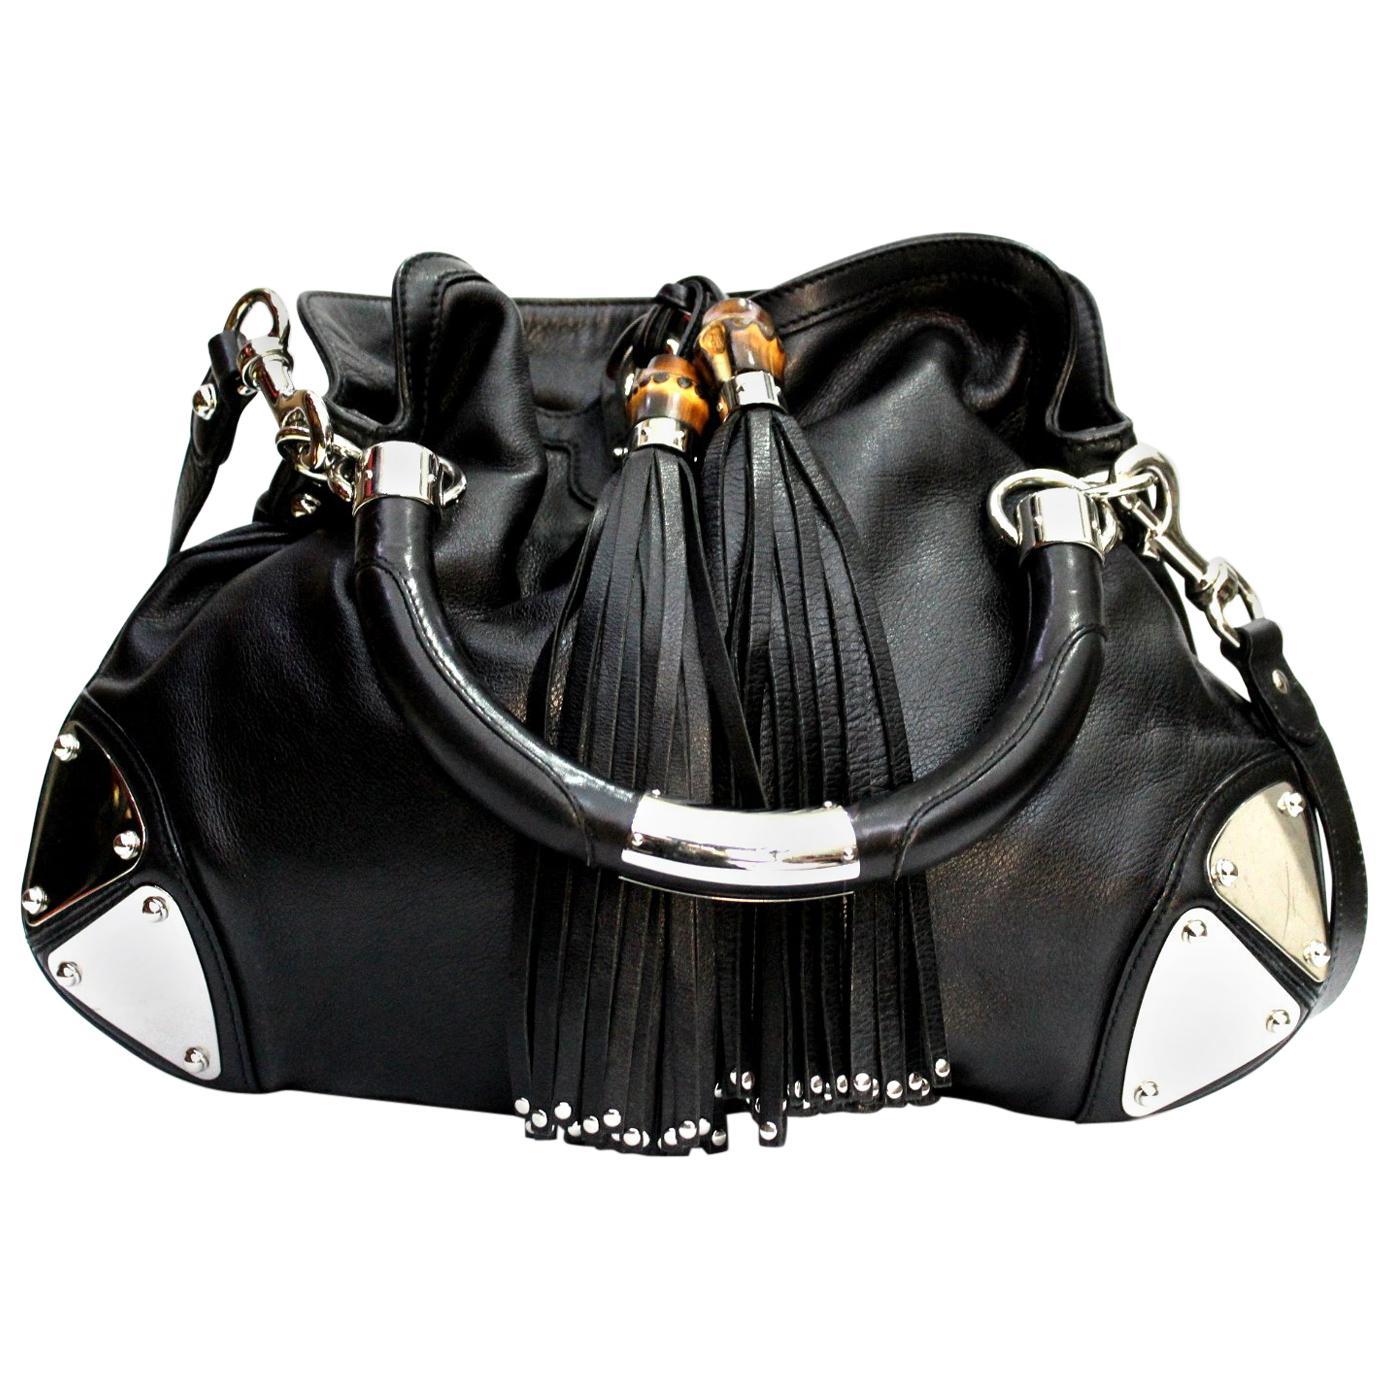 GUCCI Black Leather Small Indy Babouska Bag